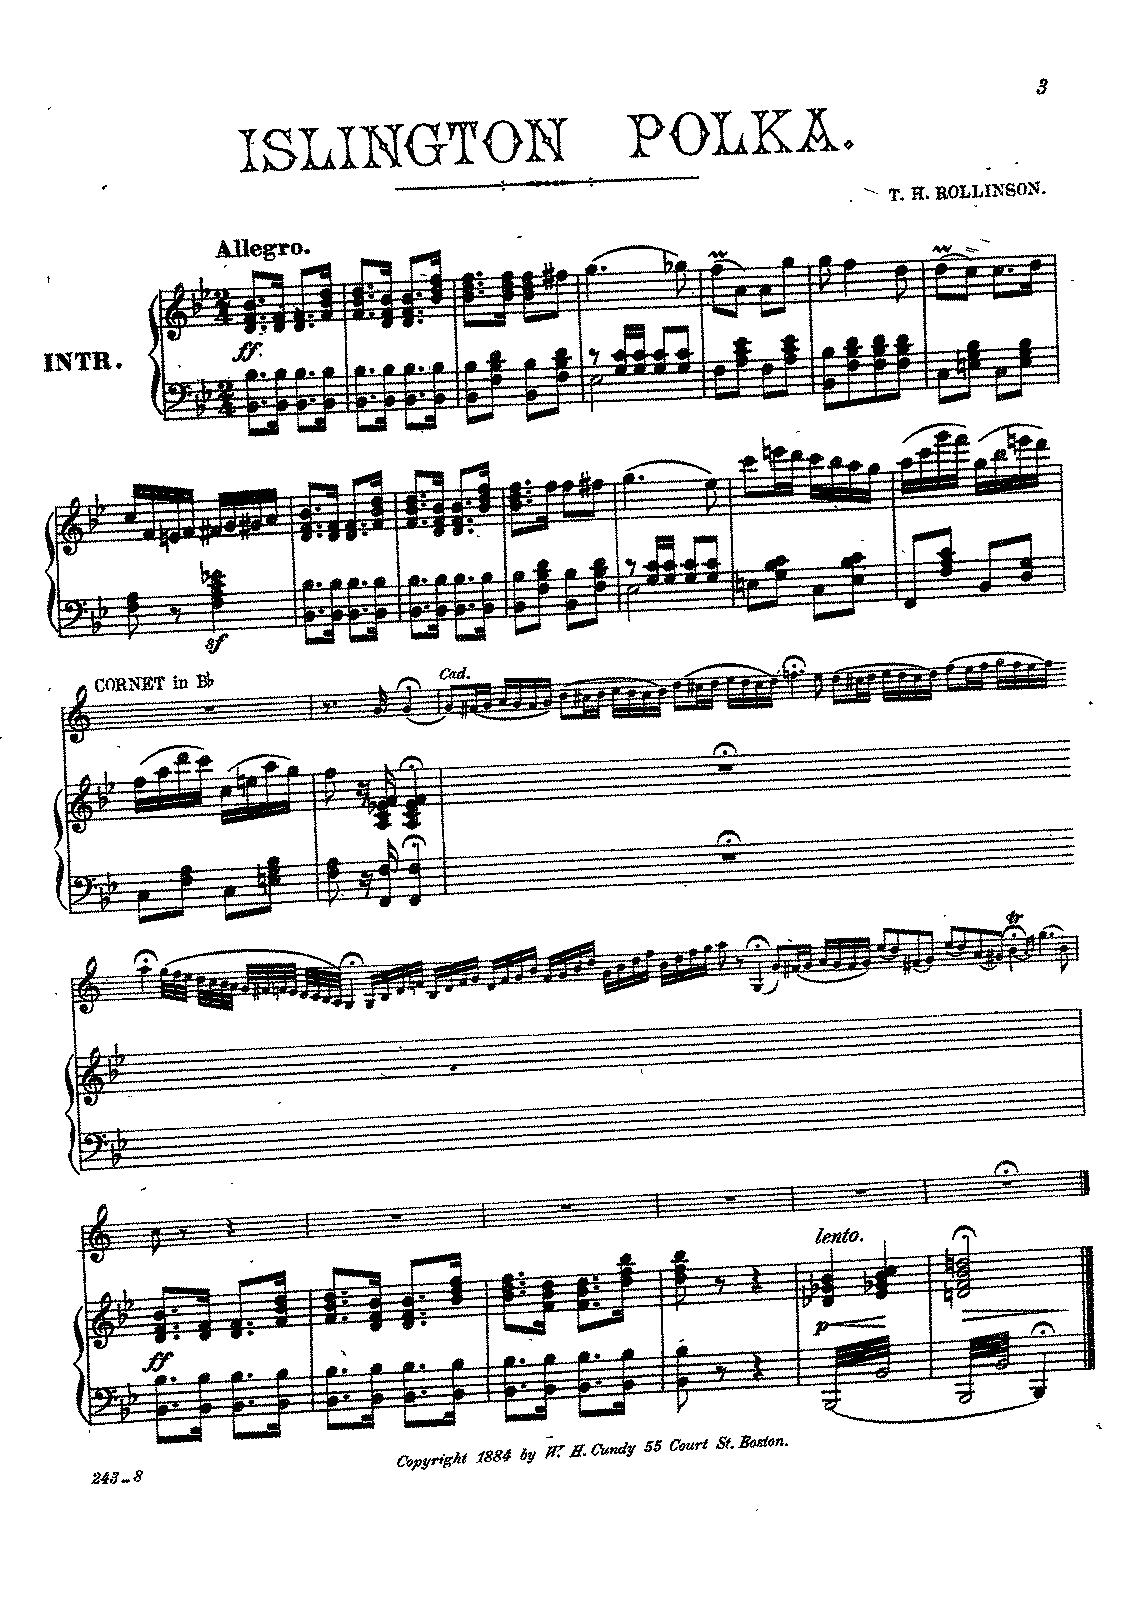 Islington Polka (Rollinson, Thomas H ) - IMSLP/Petrucci Music